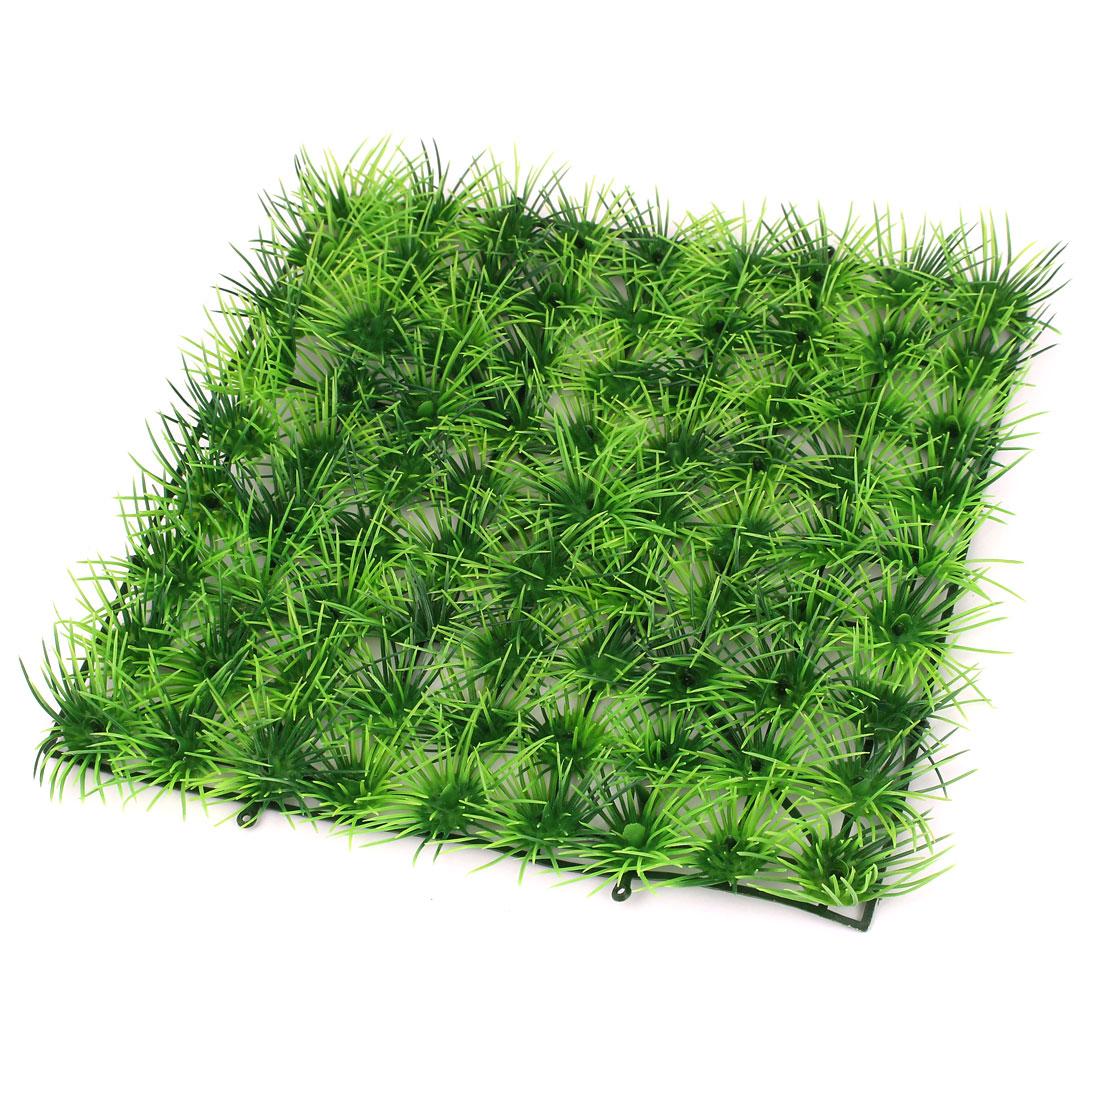 "Aquarium Landscaping Green Manmade Aquatic Grass Lawn Plant 9.4"" Length"